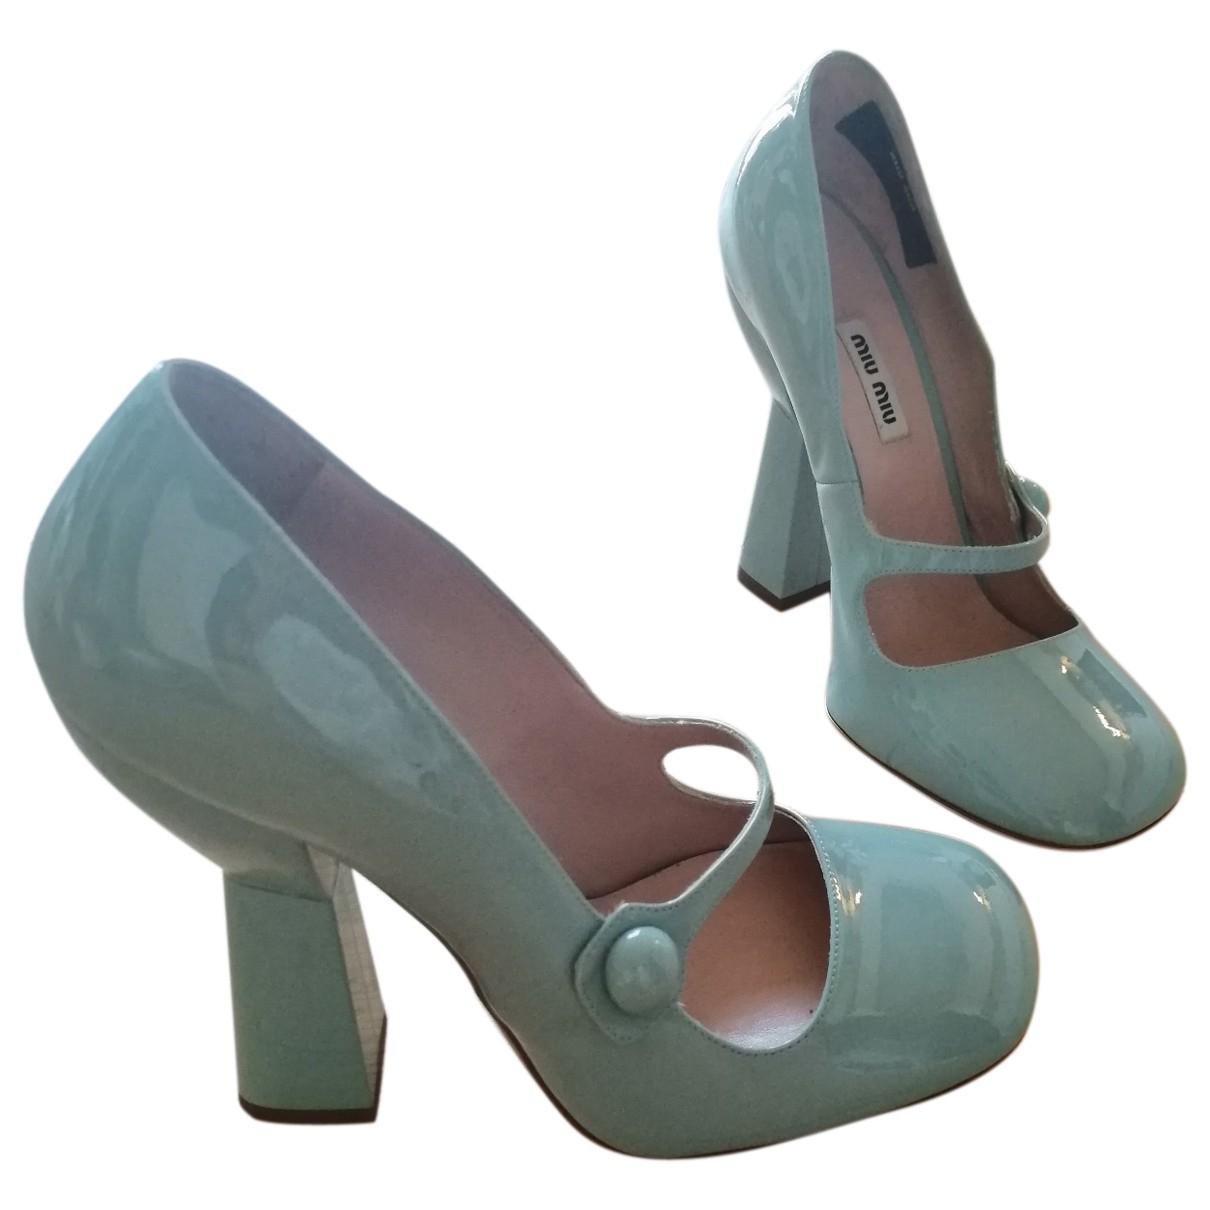 Miu Miu \N Blue Patent leather Heels for Women 40 EU